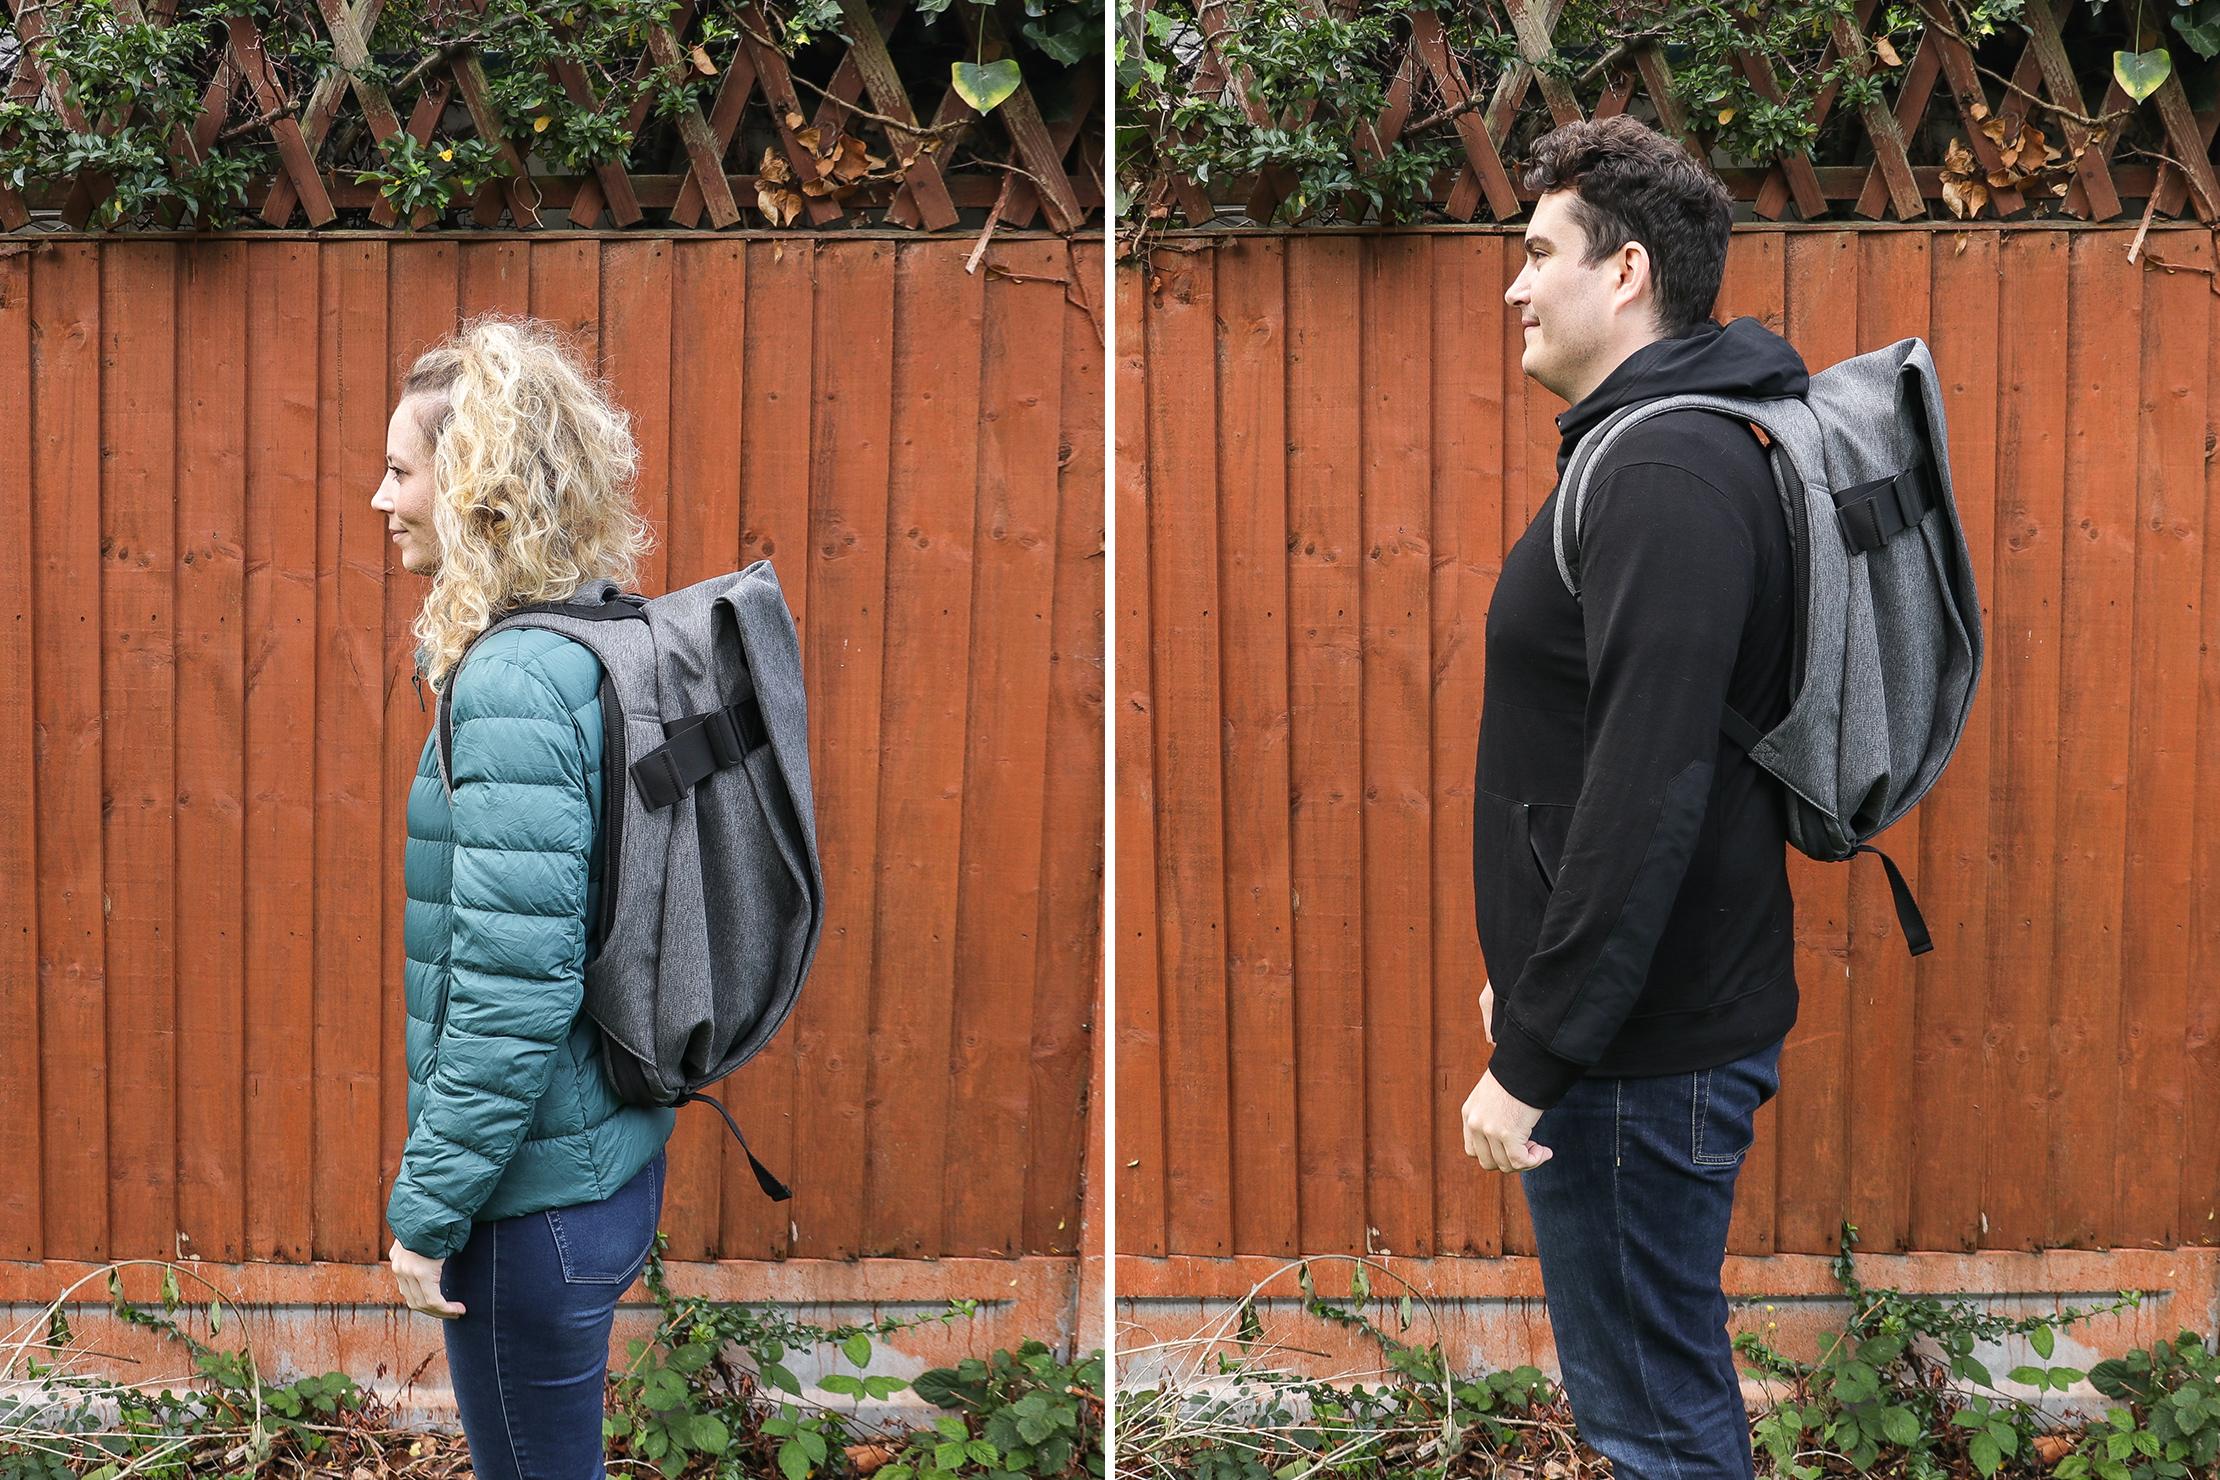 "Left: Rebecca, Height: 5'7"" (170 cm), Torso: 16"" (41 cm) | Right: Nathan Coverdale, Height: 6'4"" (193 cm), Torso: 19""(48 cm)"